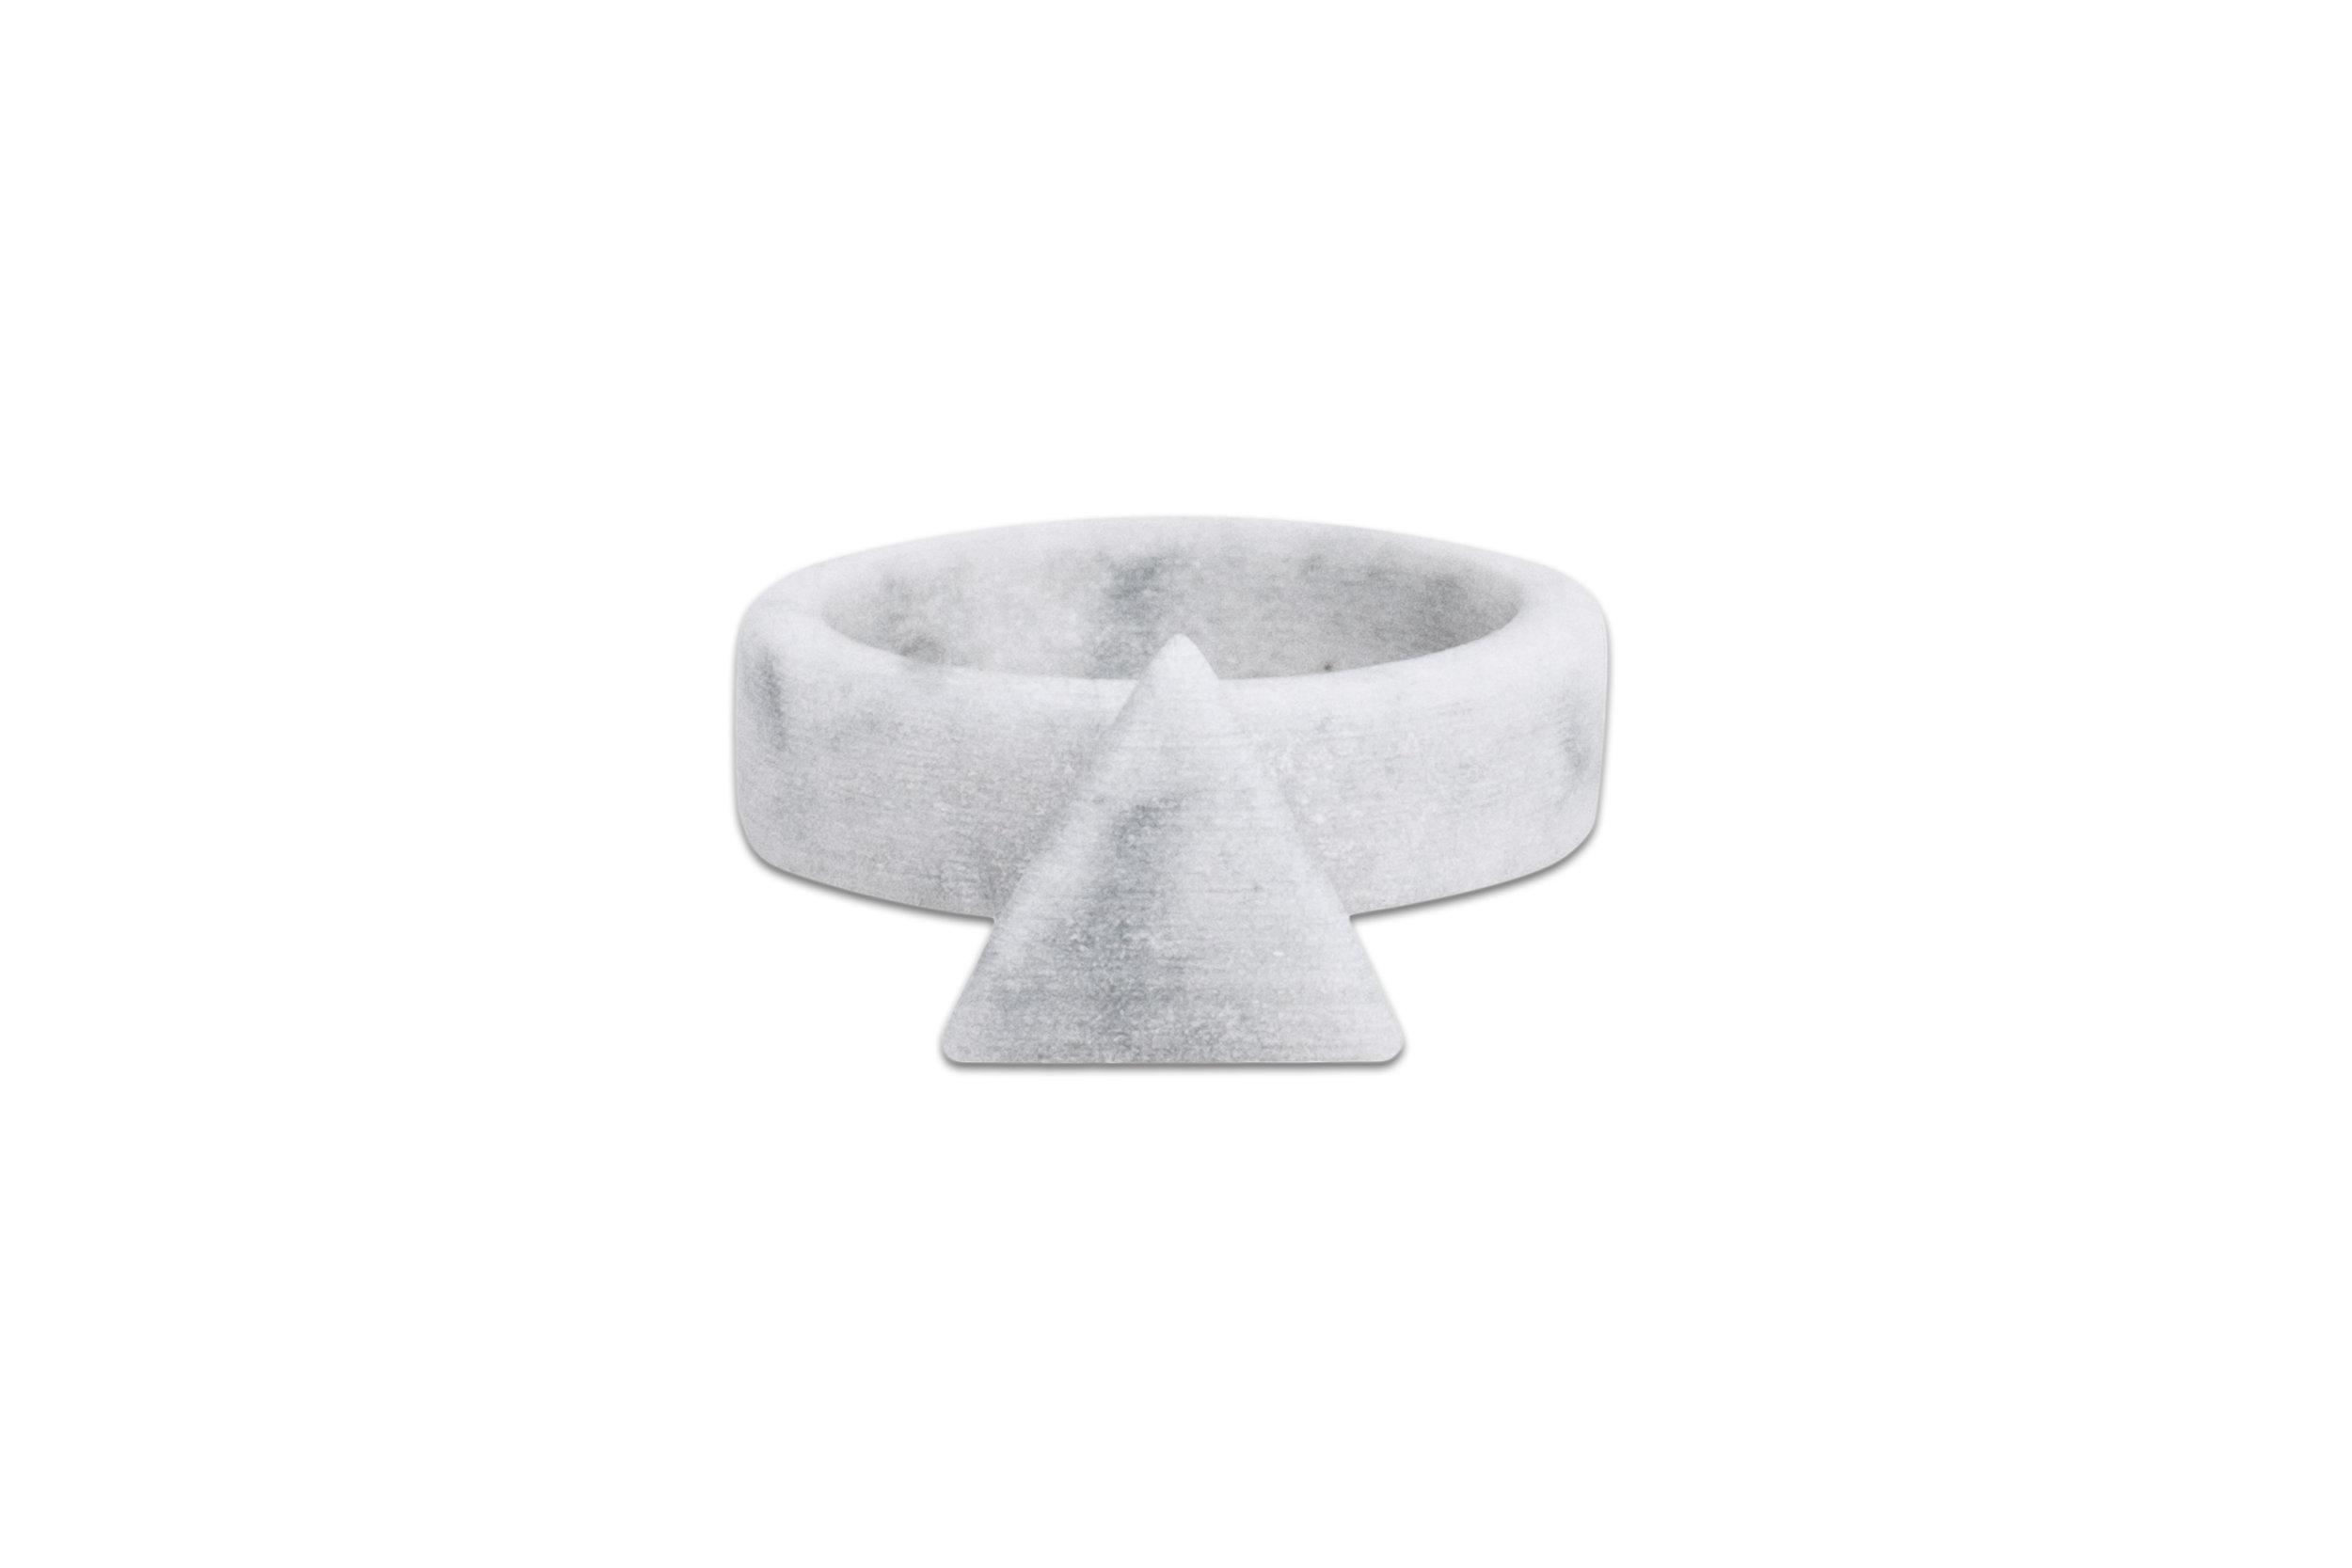 Tokio_Ring_Digital Marble_Carrara_Space Junk_2014.jpg